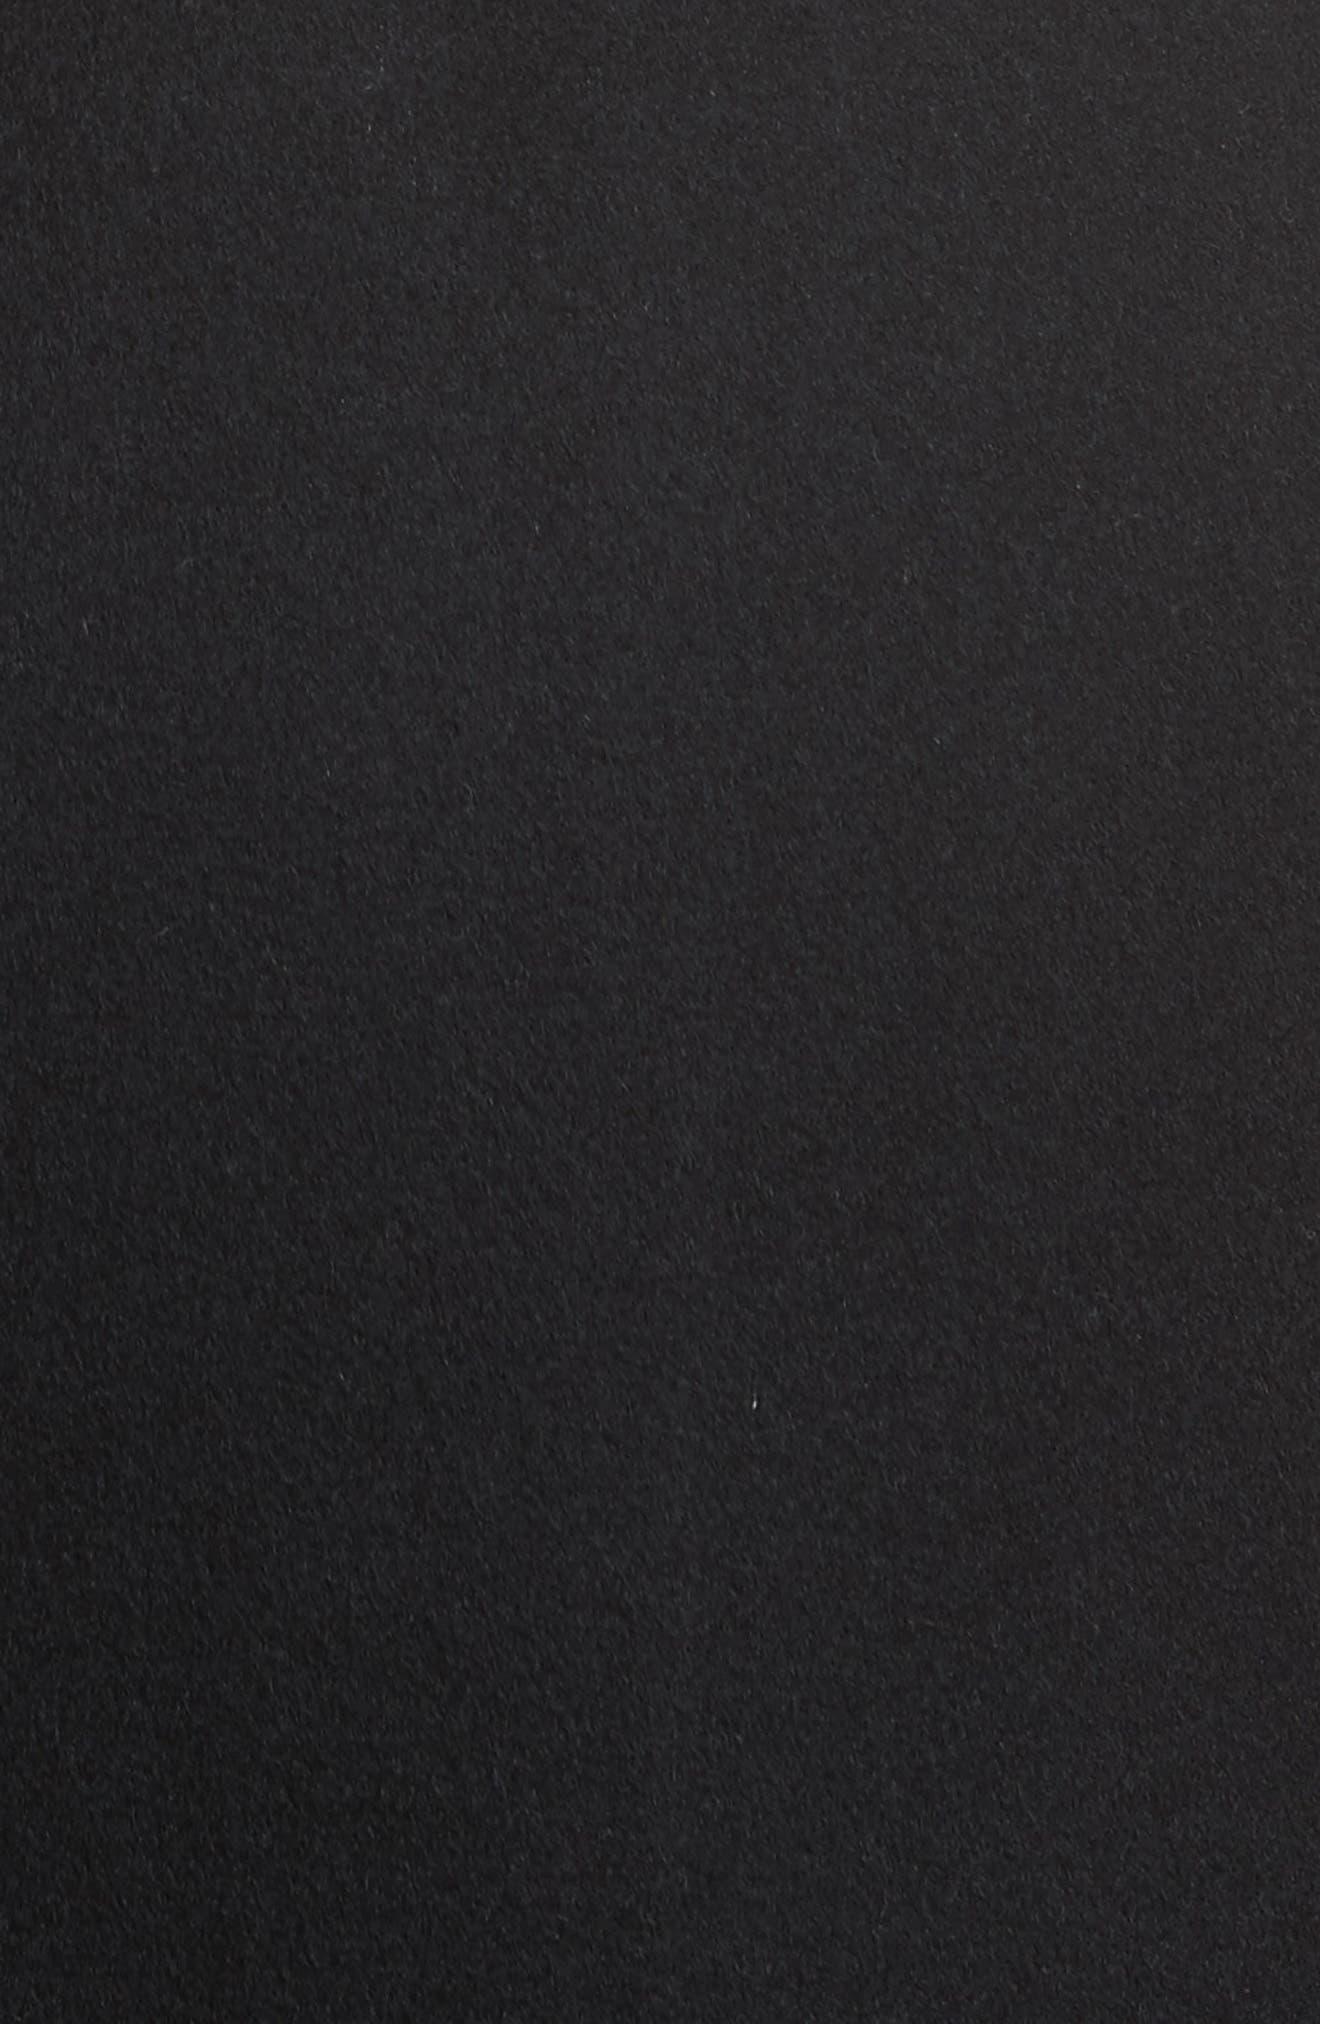 Divya Reversible Vest with Genuine Shearling Trim,                             Alternate thumbnail 7, color,                             001